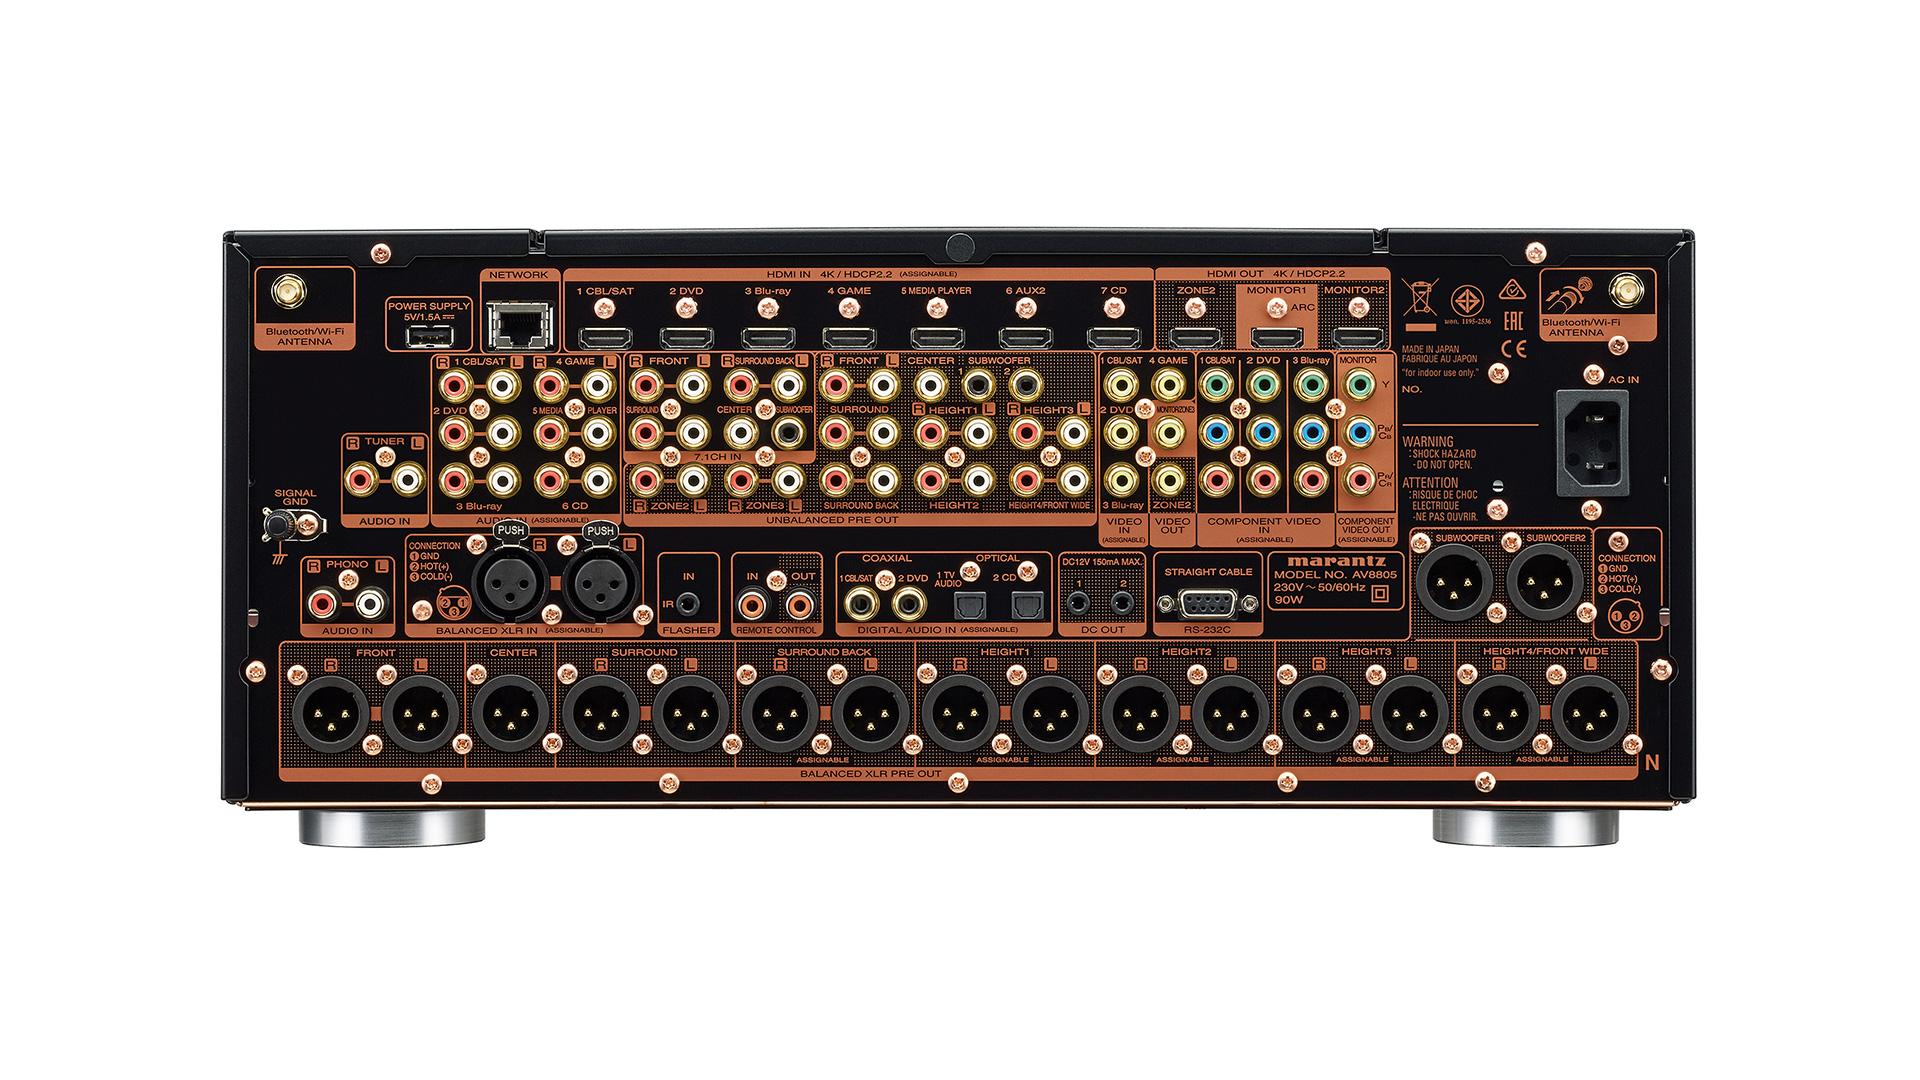 Marantz AV8805 AV Surround Processor (Back) at Creative Audio in Winnipeg